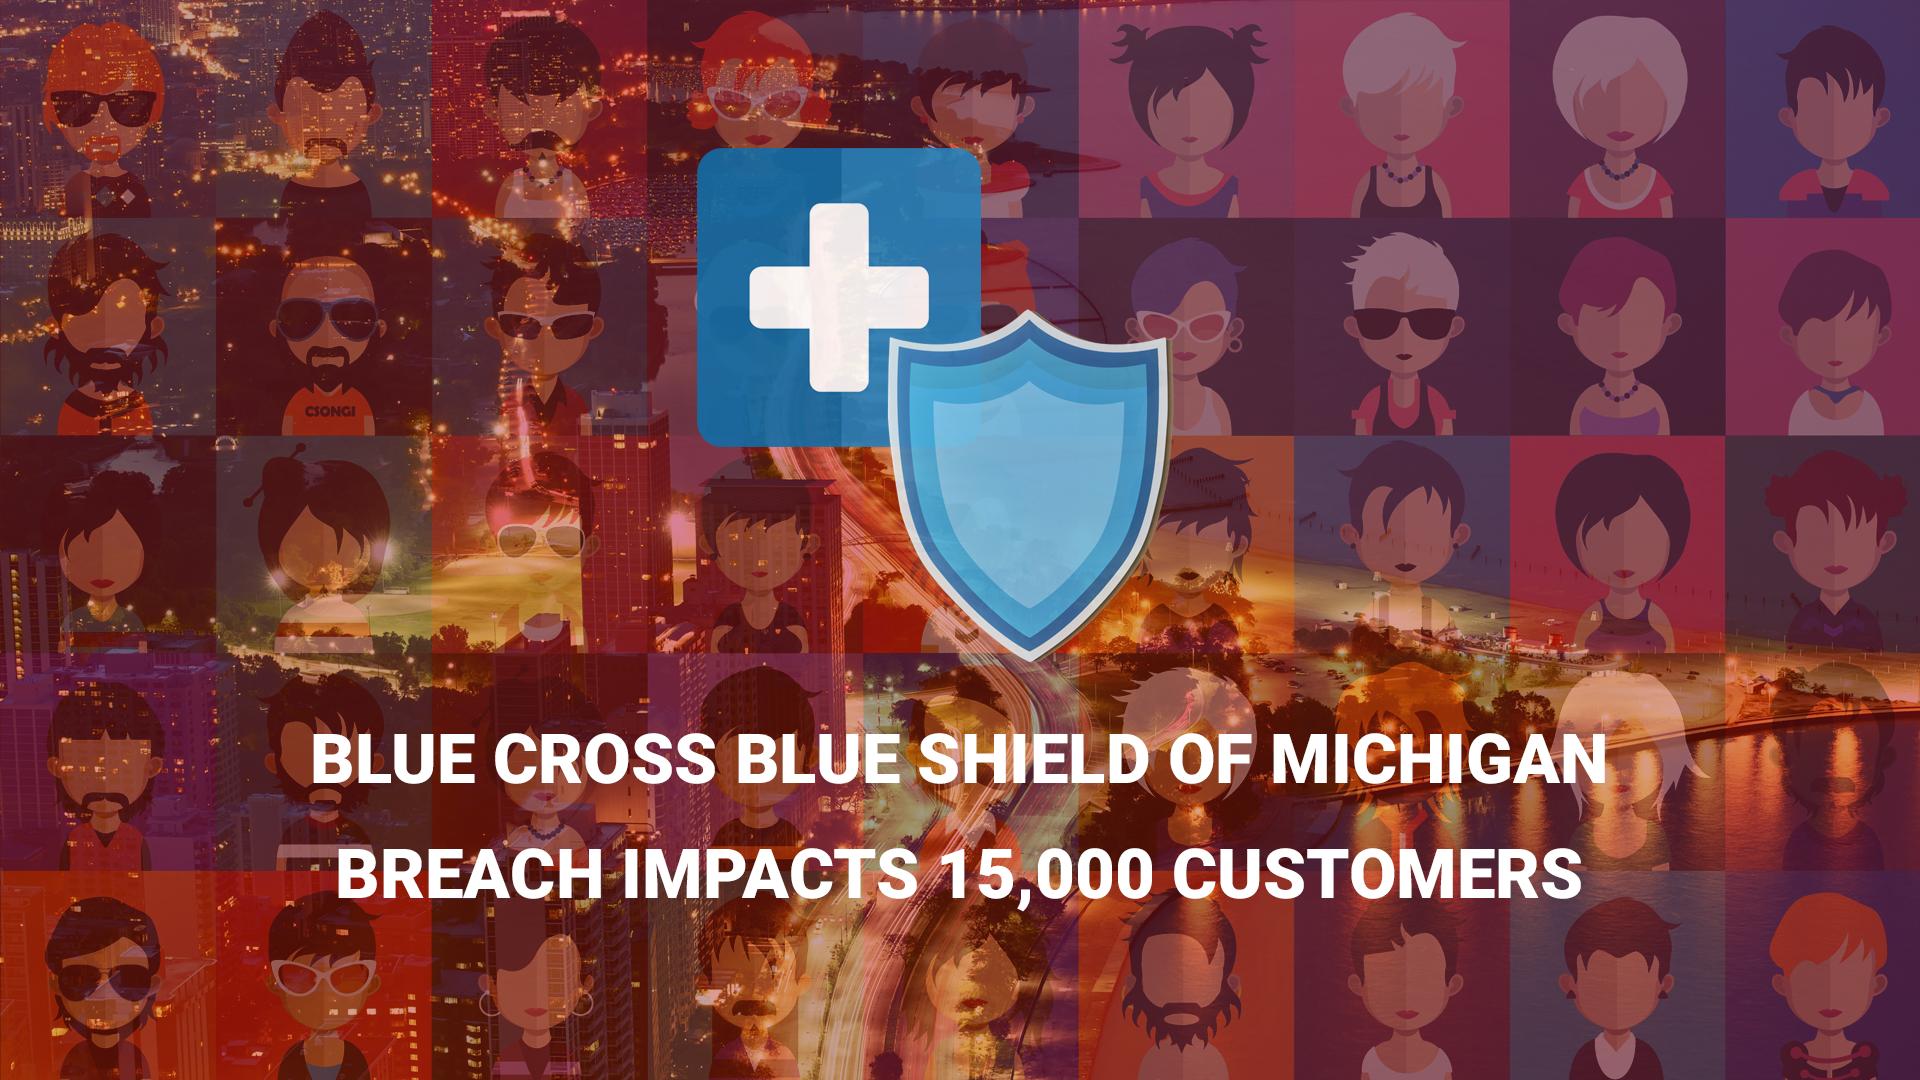 Blue Cross Blue Shield of Michigan Breach Impacts 15,000 Customers